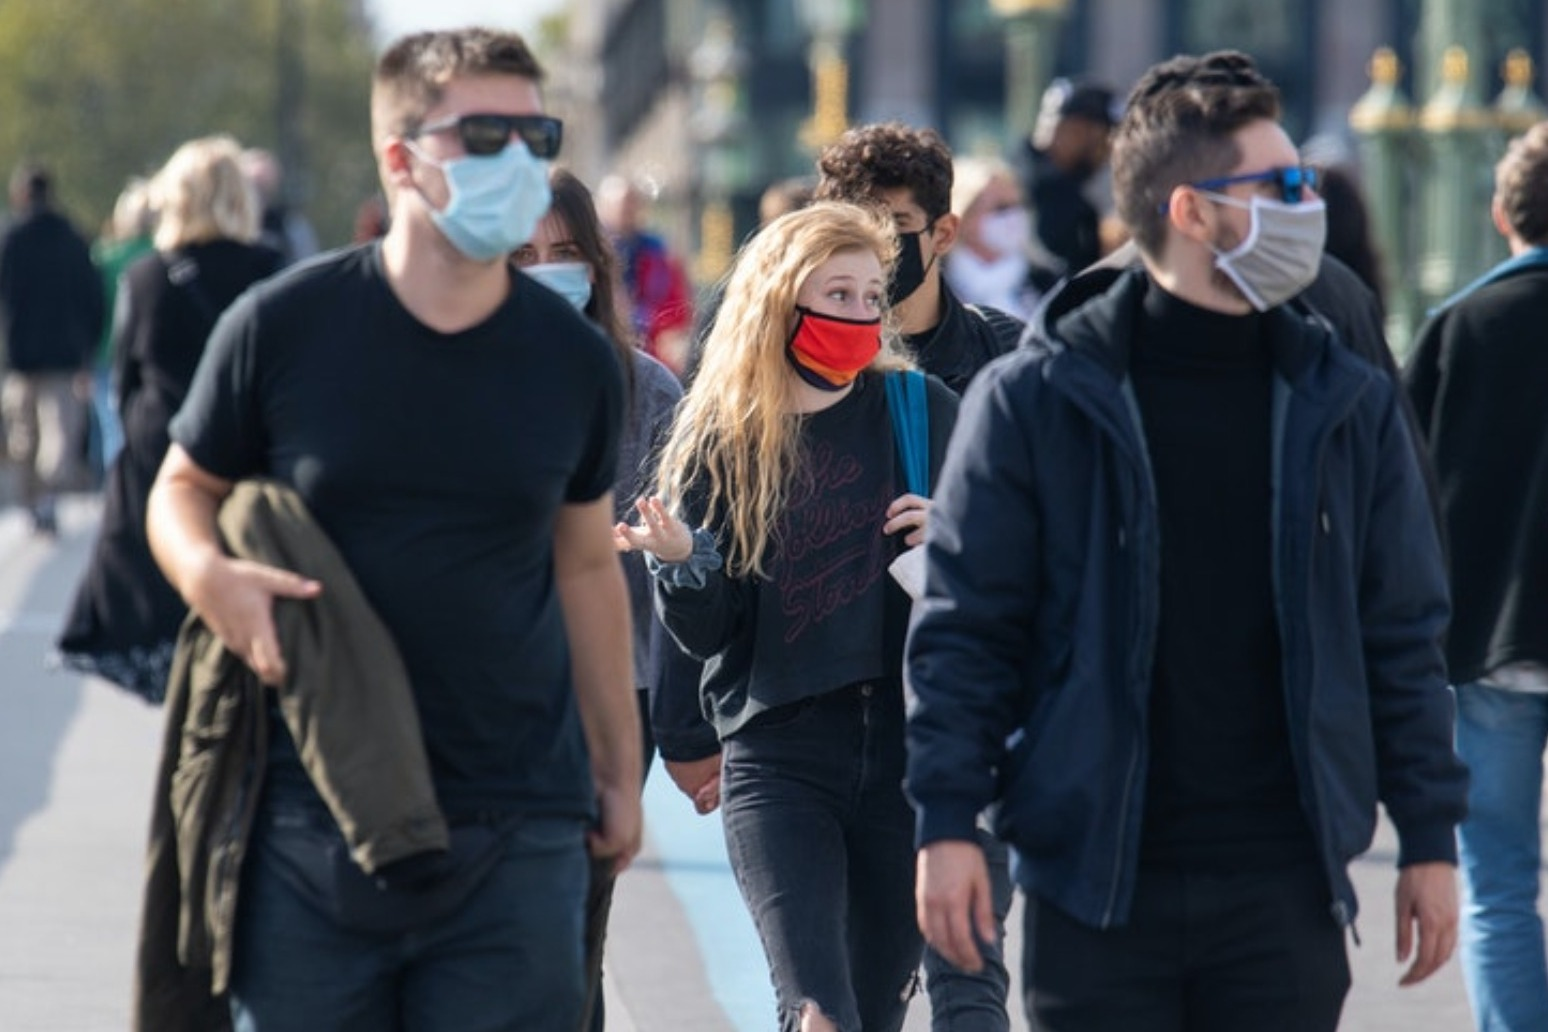 Coronavirus: Global death toll passes one million